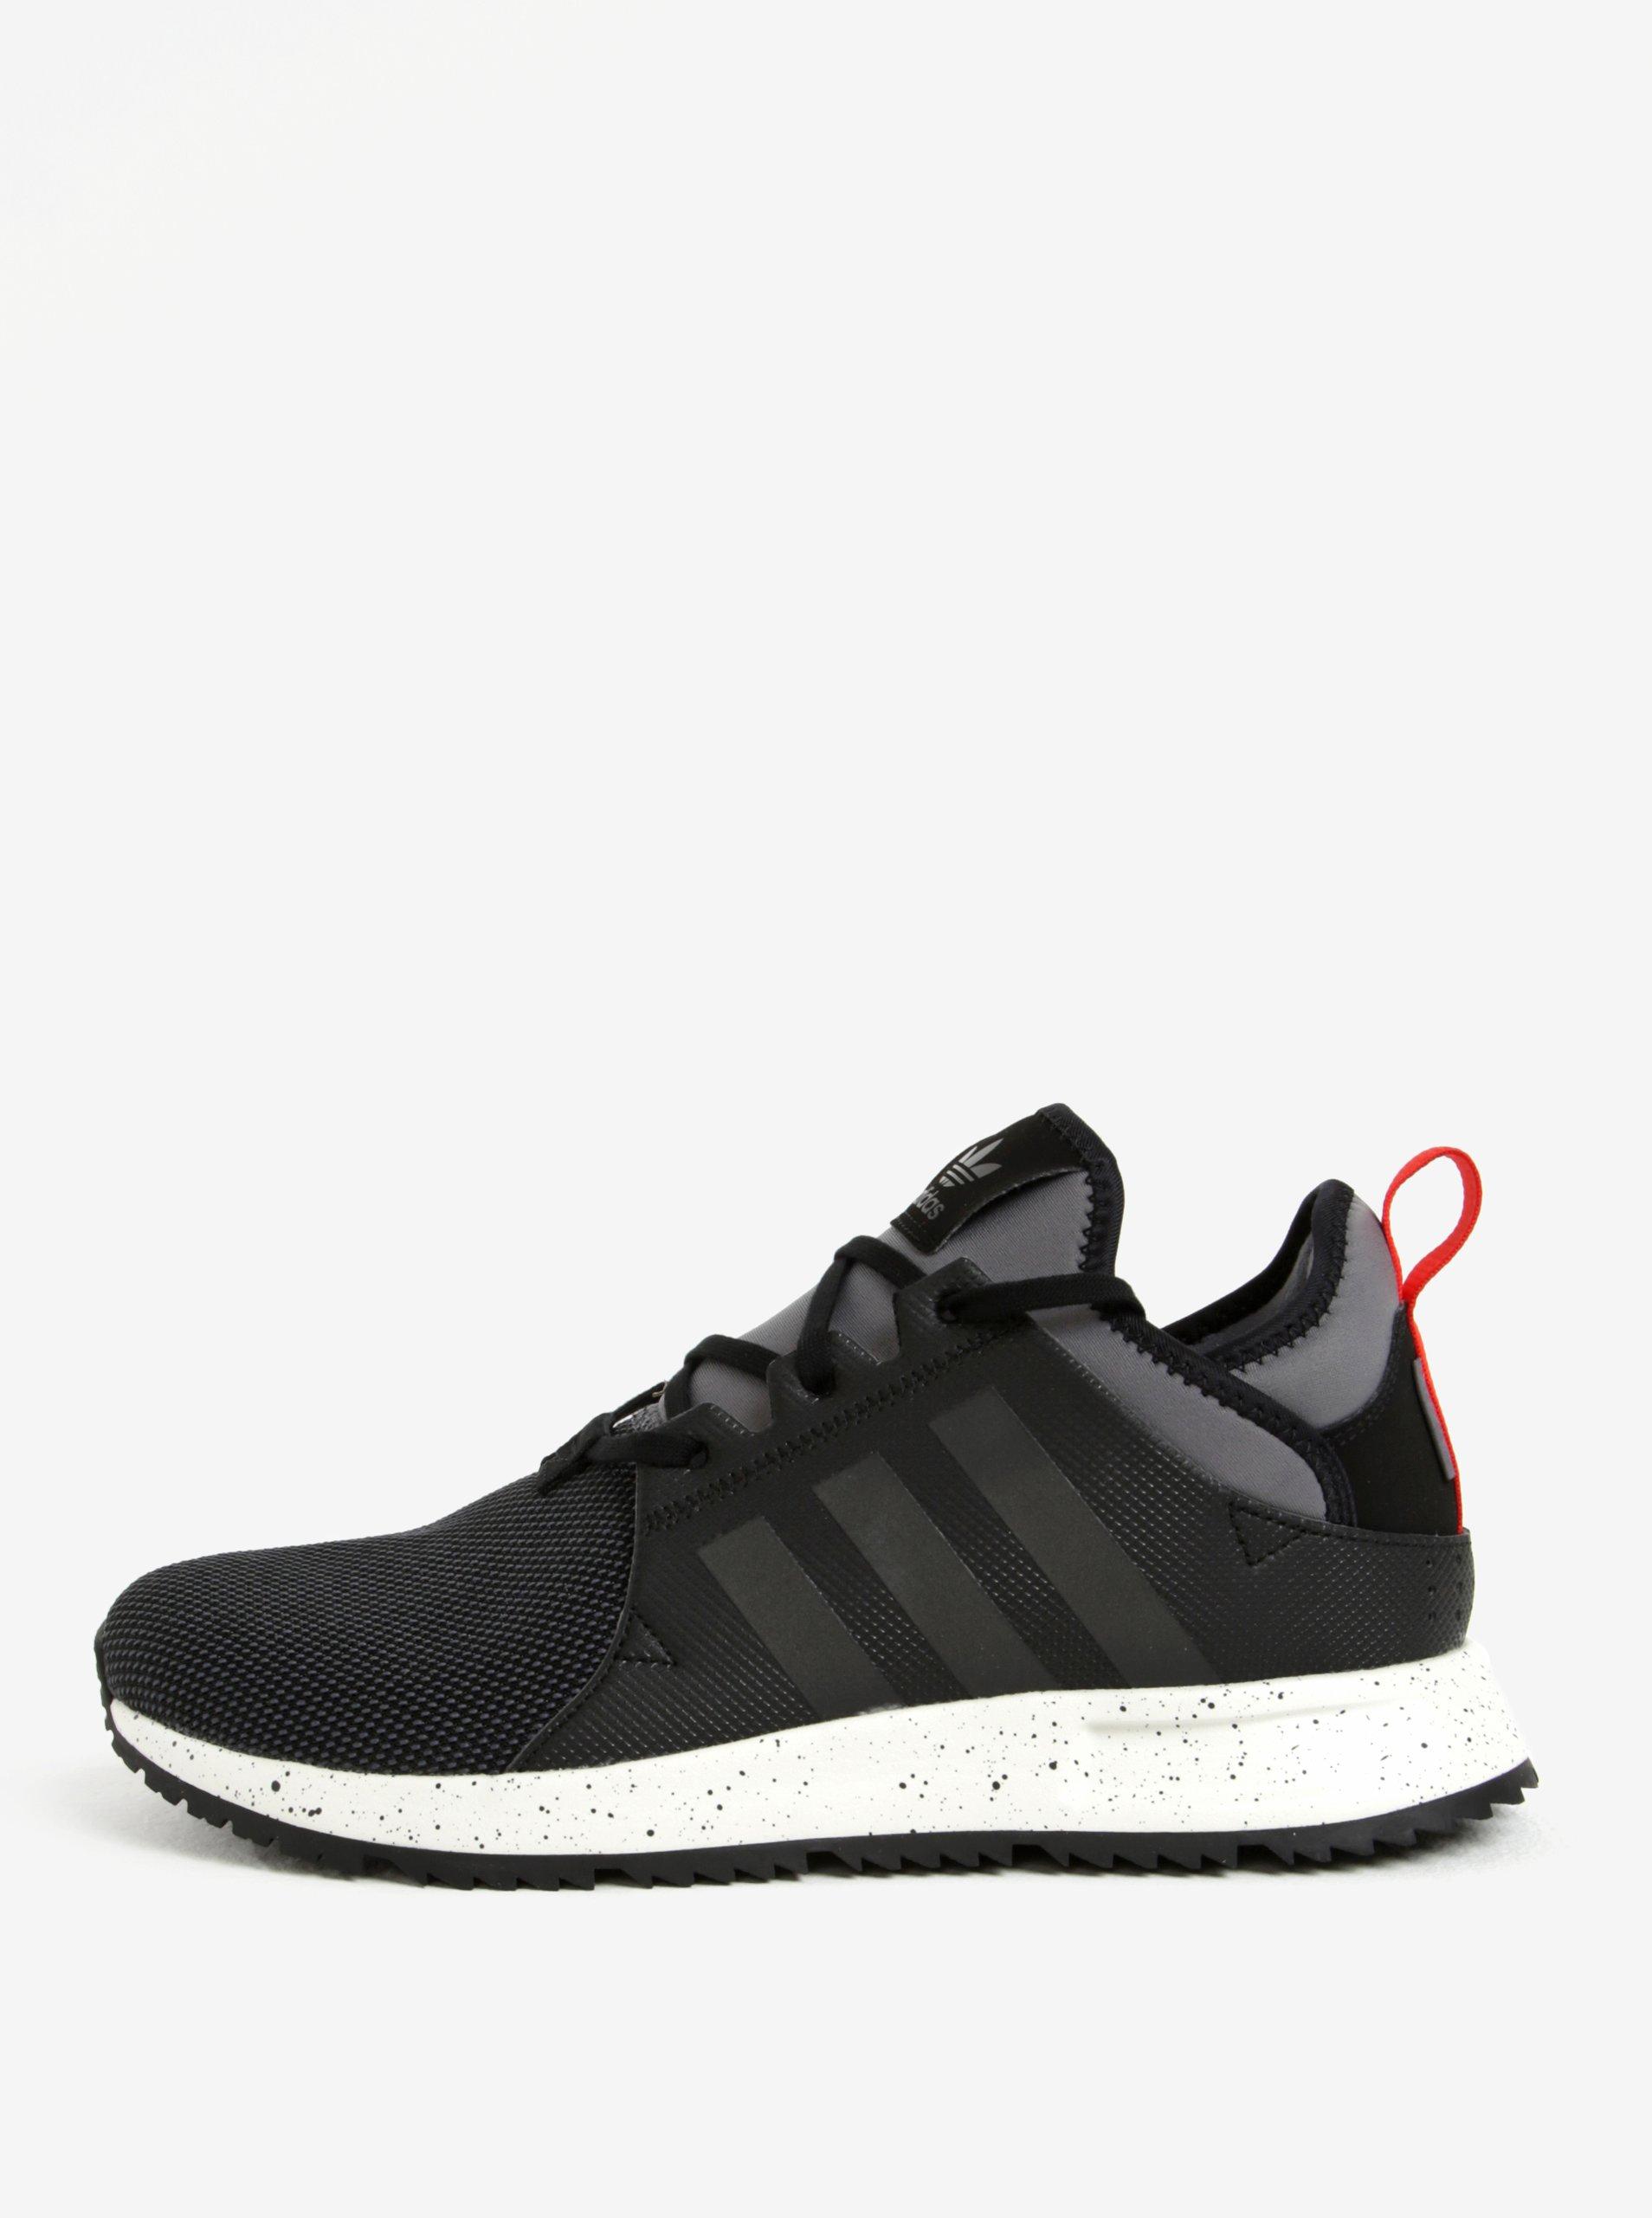 Sivo–čierne pánske tenisky adidas Originals PLR Sneakerboot f8f2018fbbc